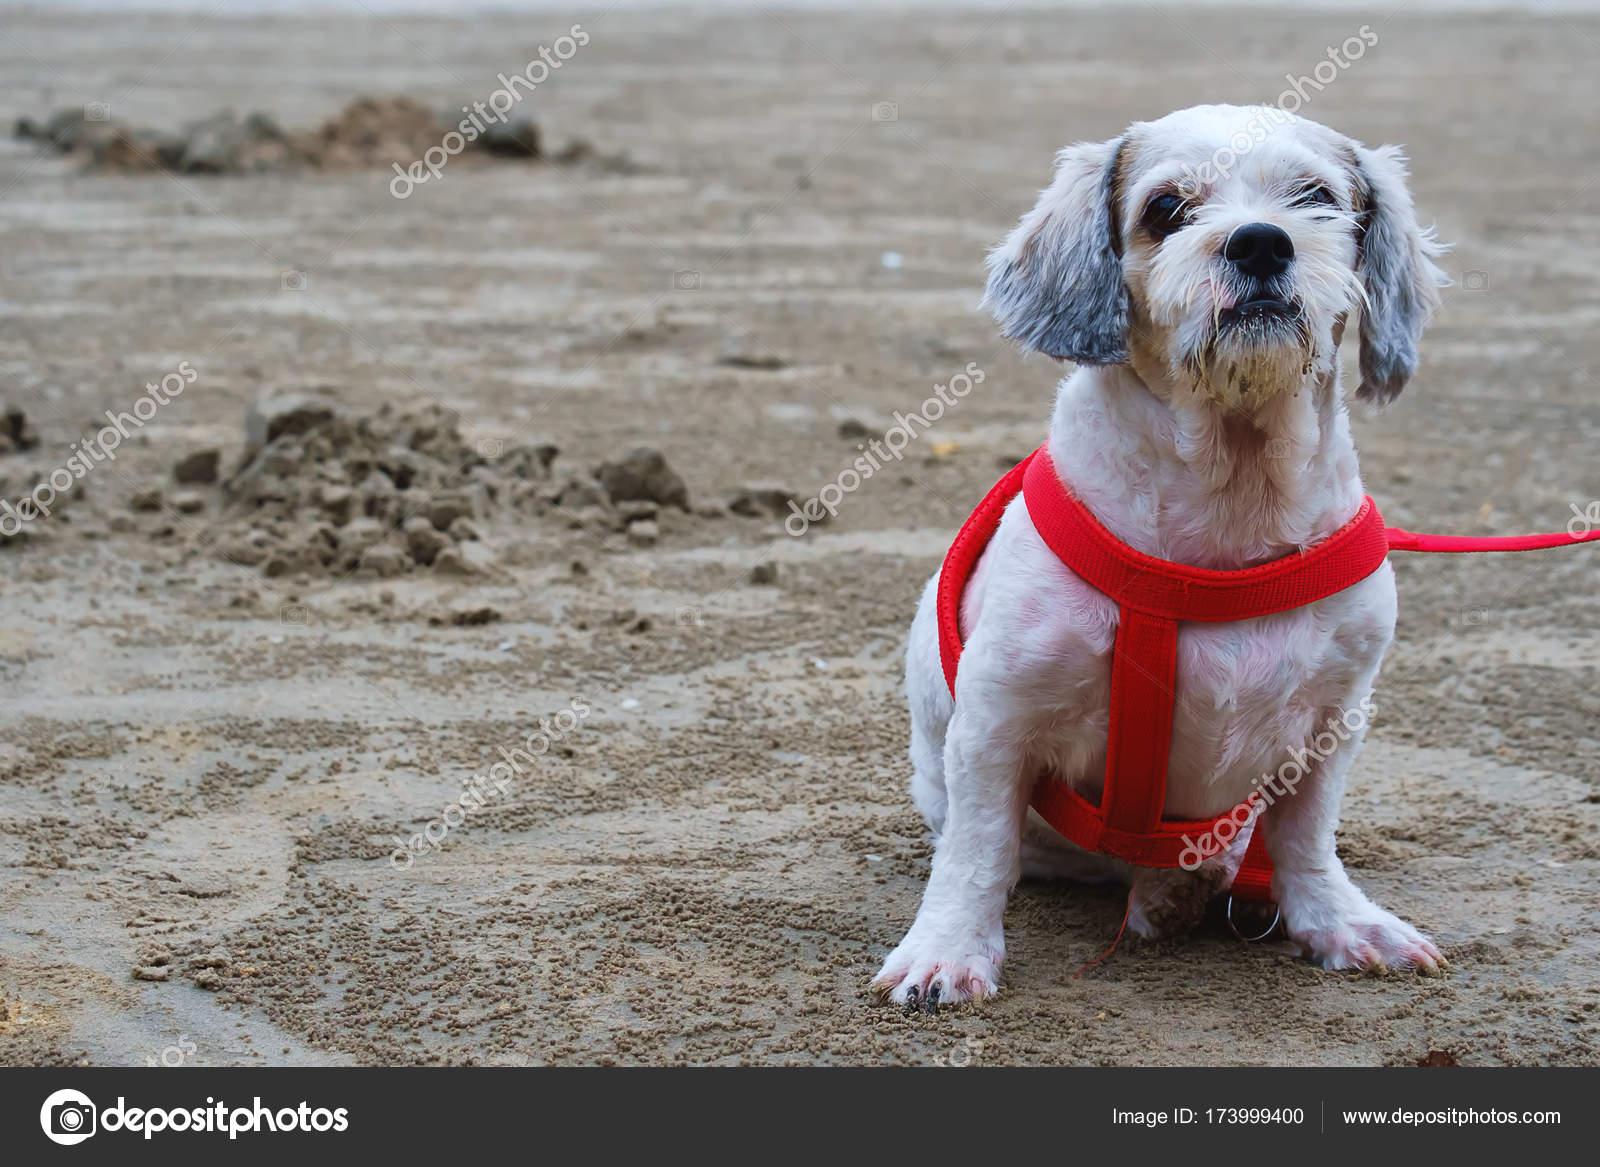 White Short Hair Shih Tzu Dog Sitting On The Beach Stock Photo